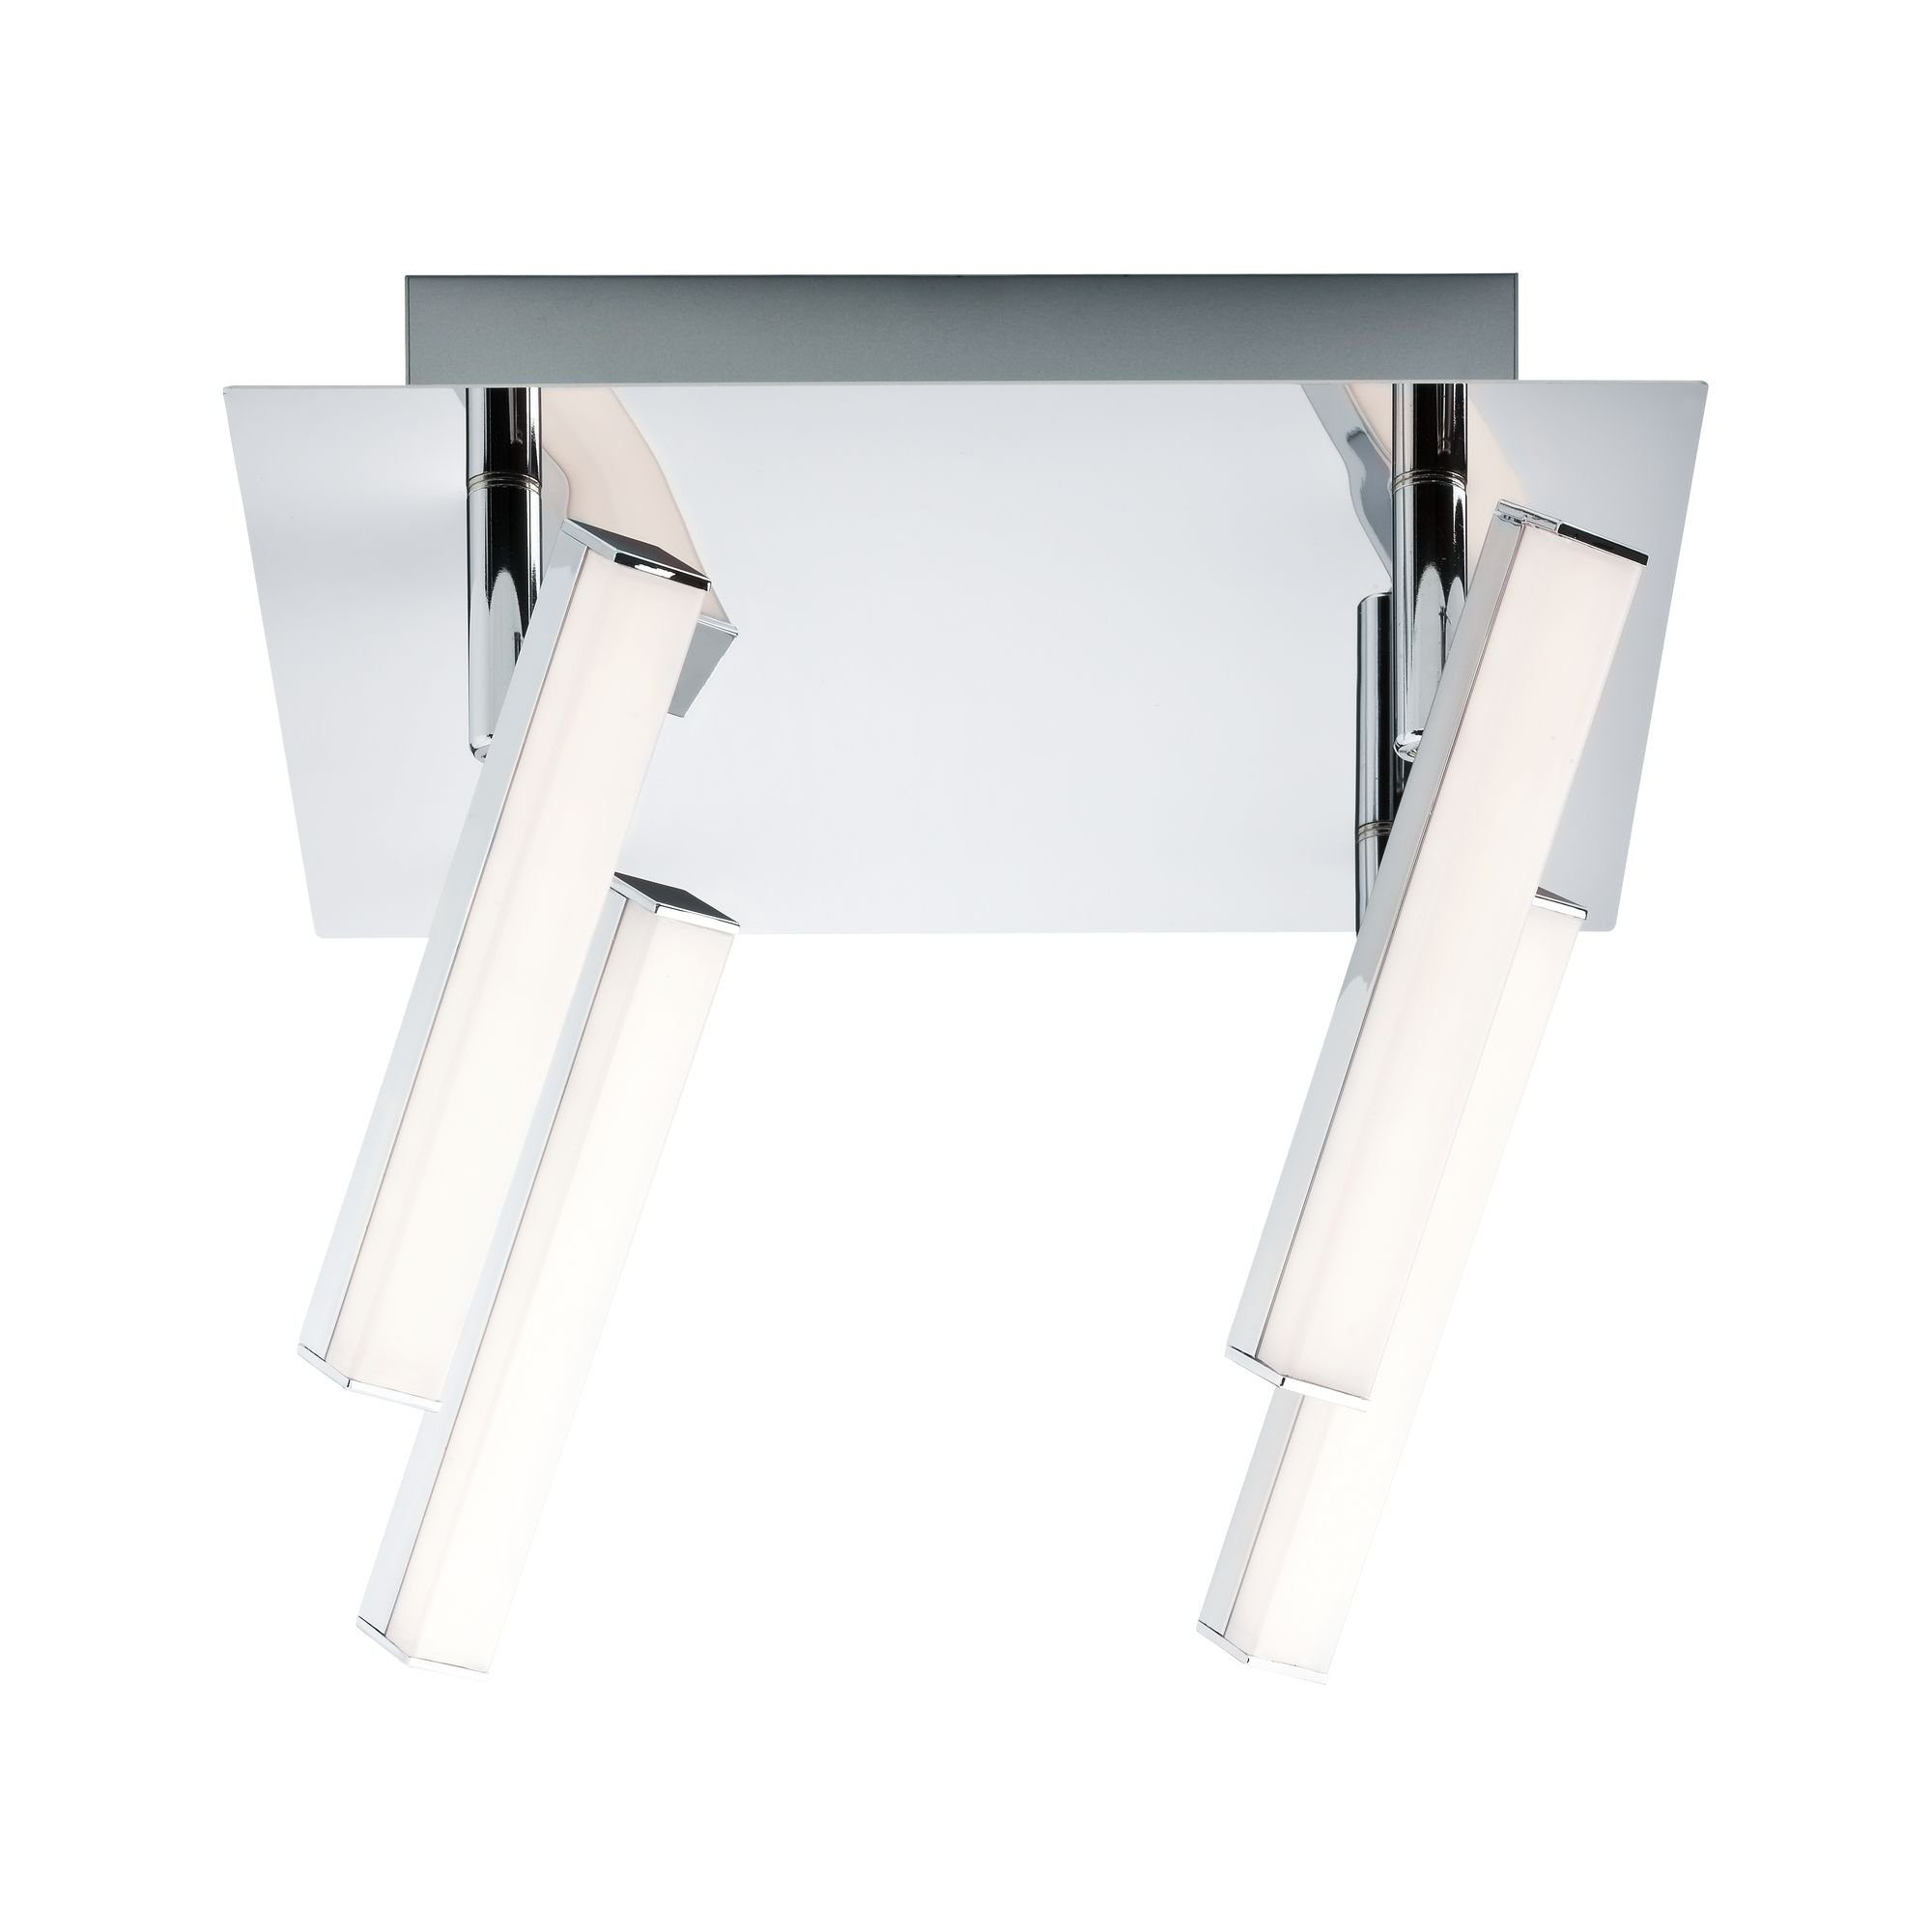 Paulmann,LED Deckenleuchte 4er-Spot Chrom Silberfarben Pole 4x4,2W